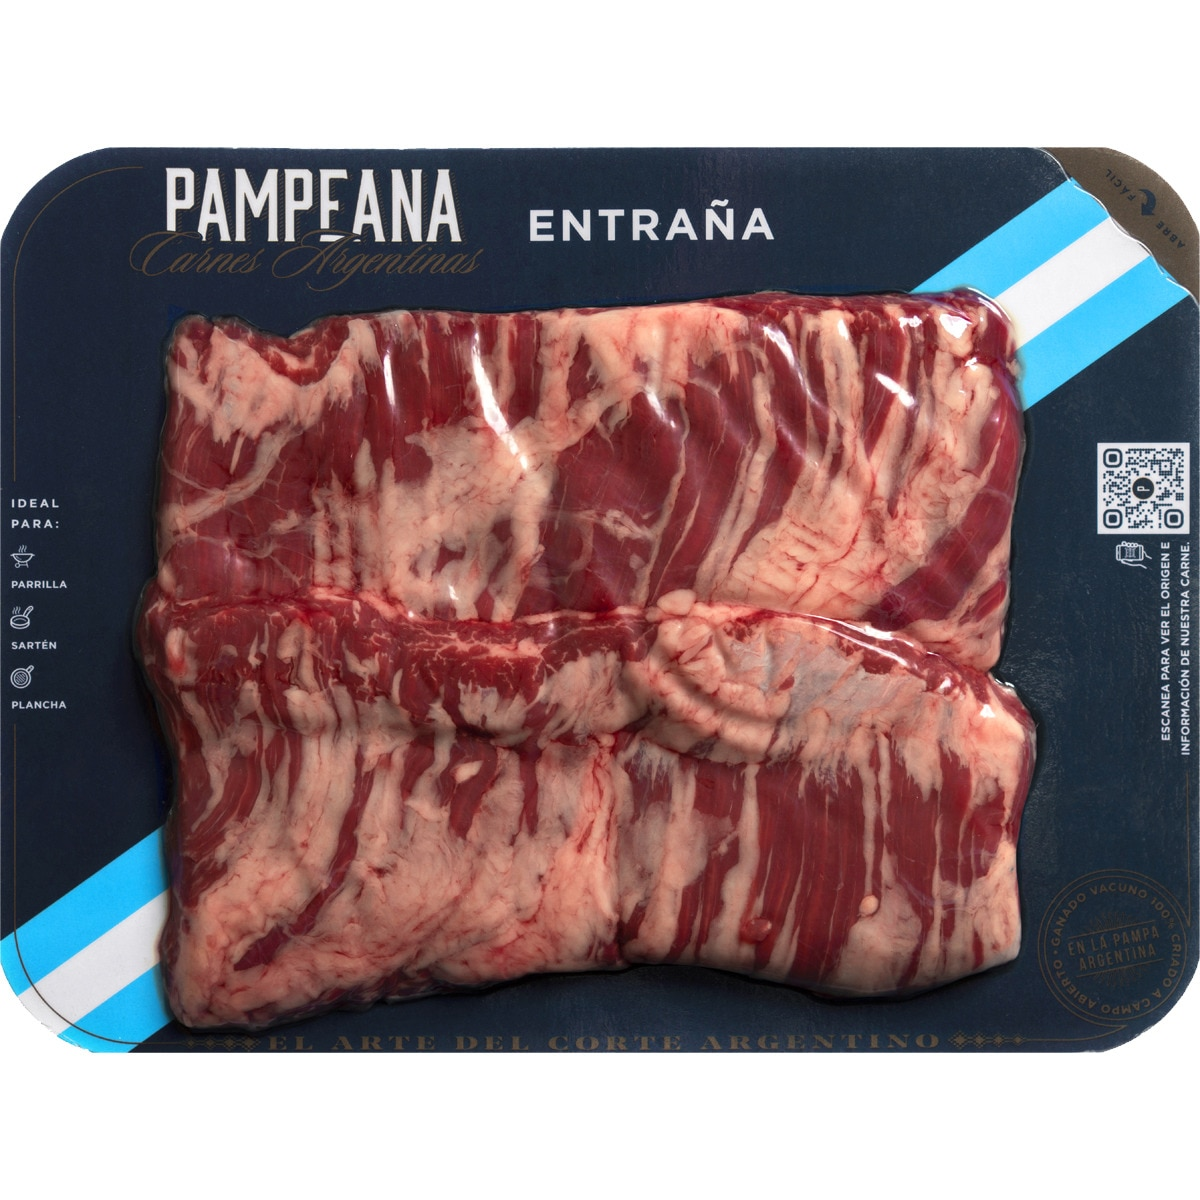 PAMPEANA novillo argentino entraña peso aproximado bandeja 400 g